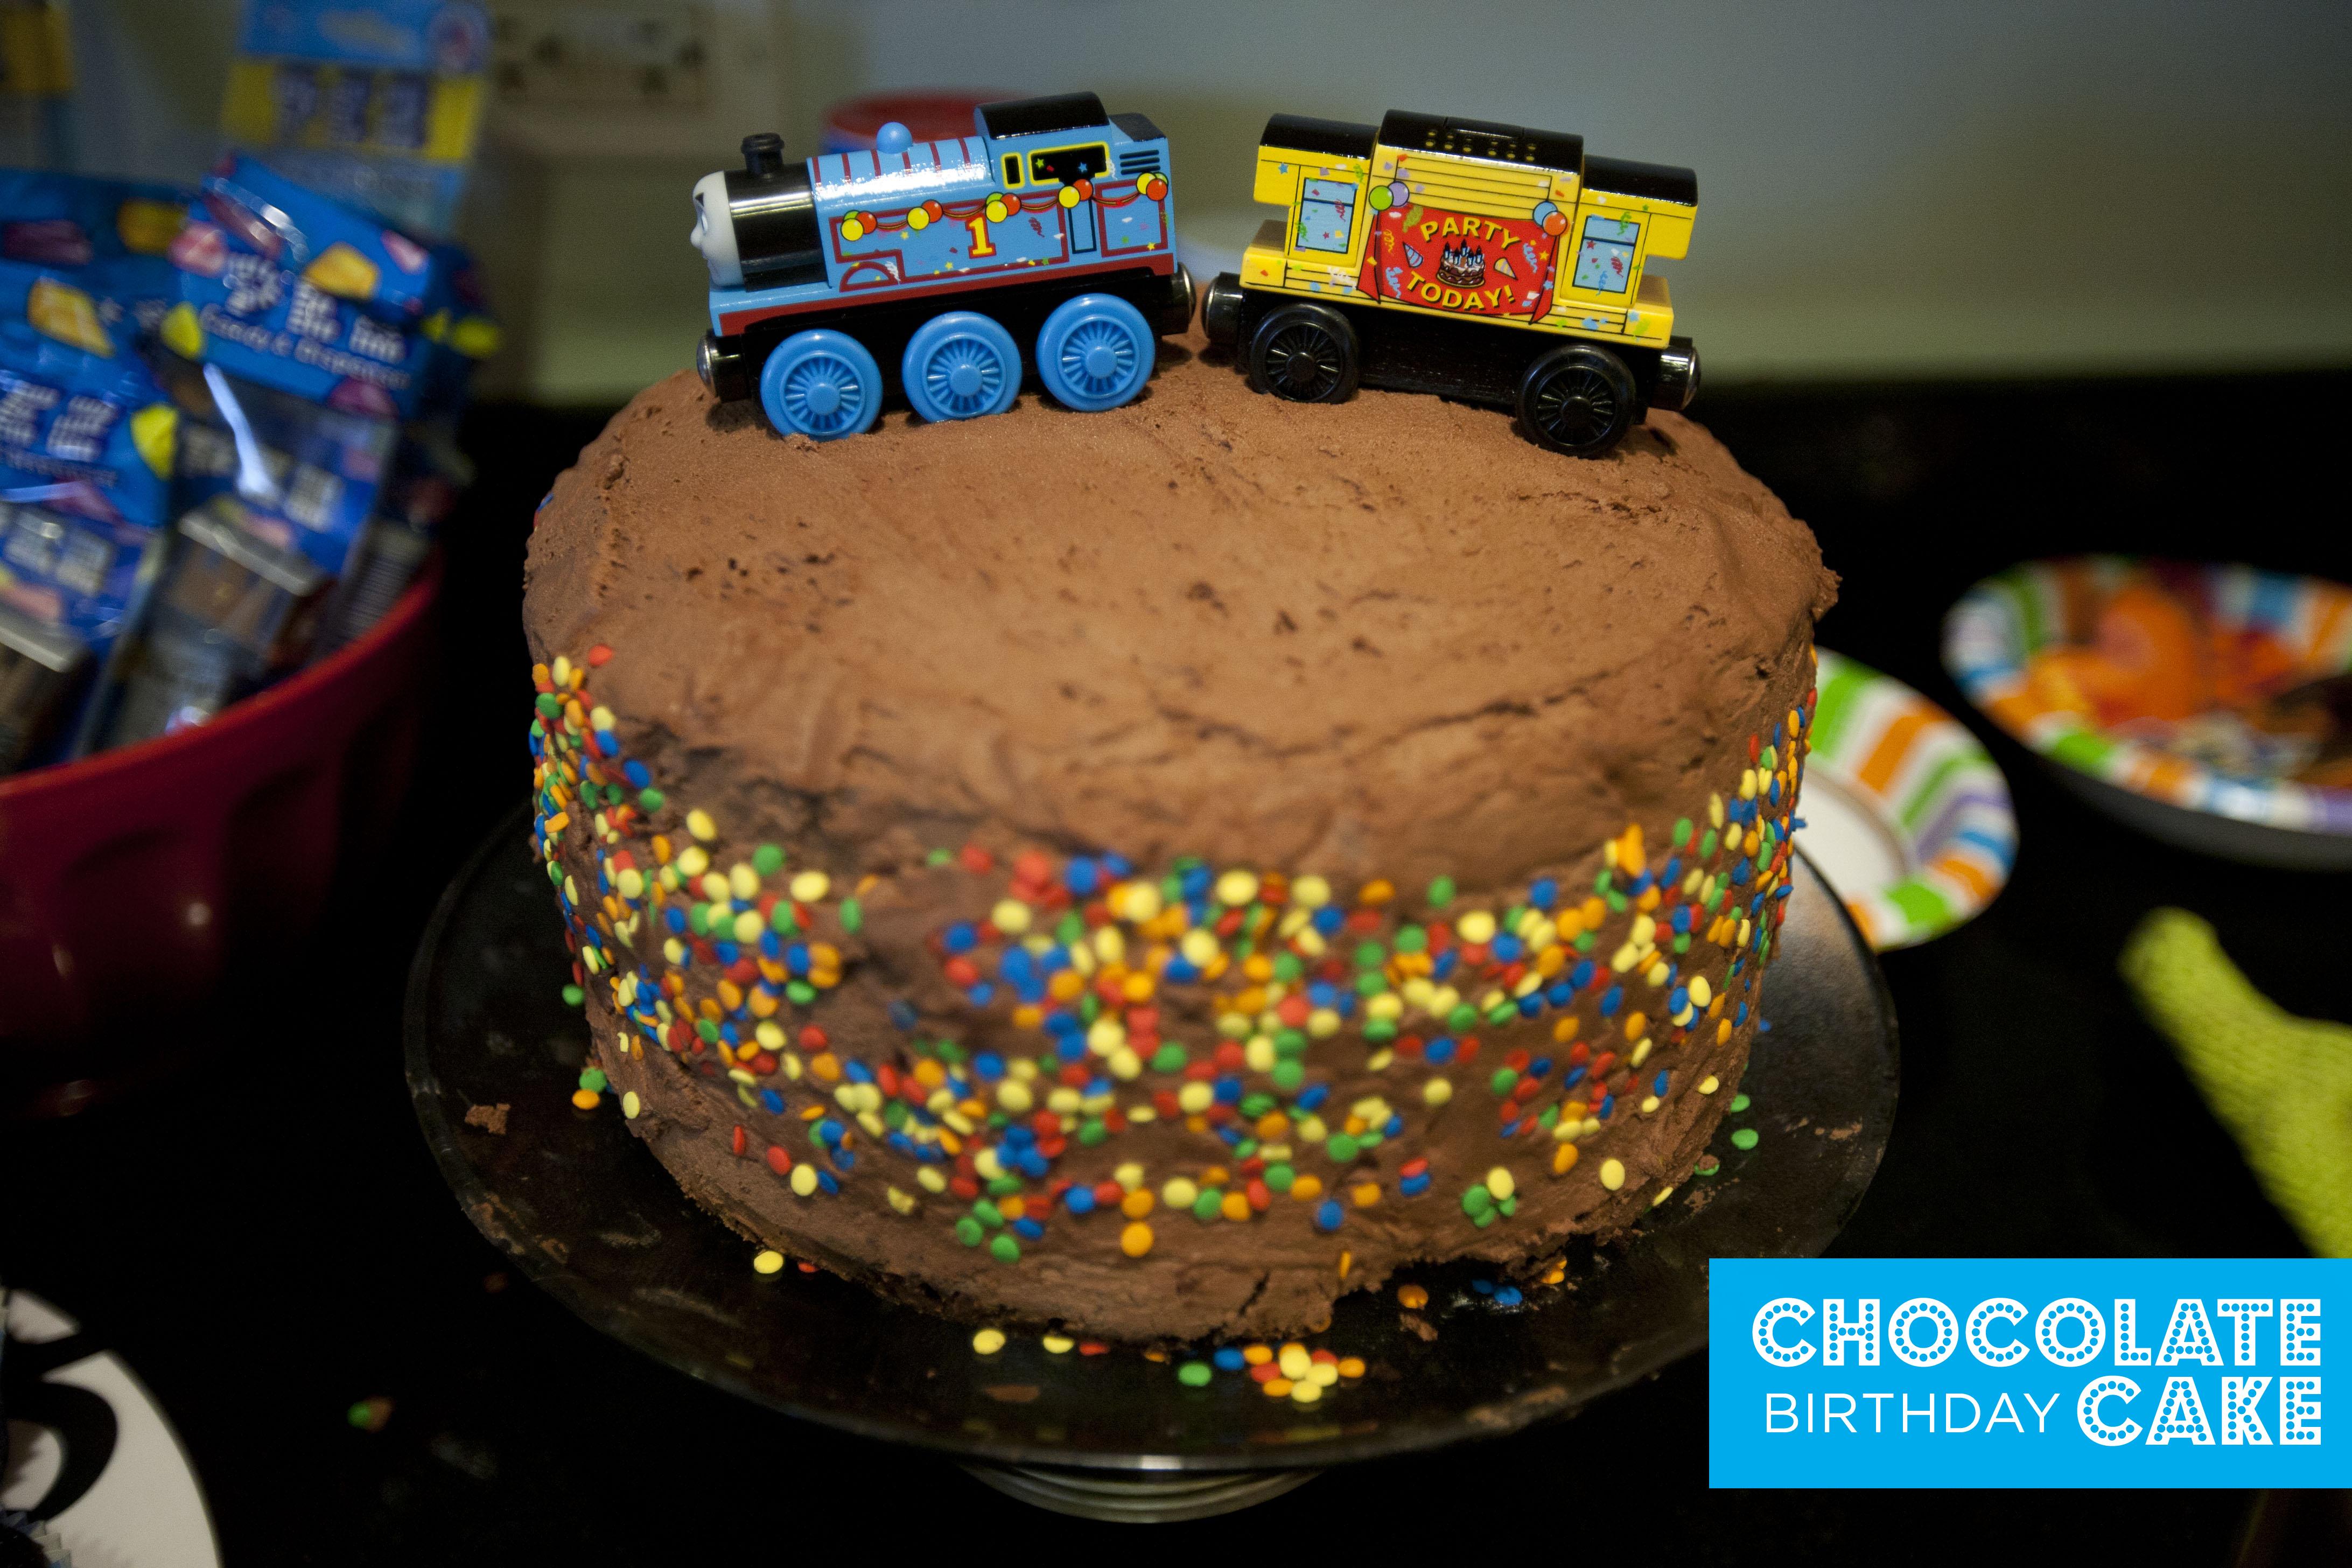 thomas the train make great on chocolate train birthday cake recipe